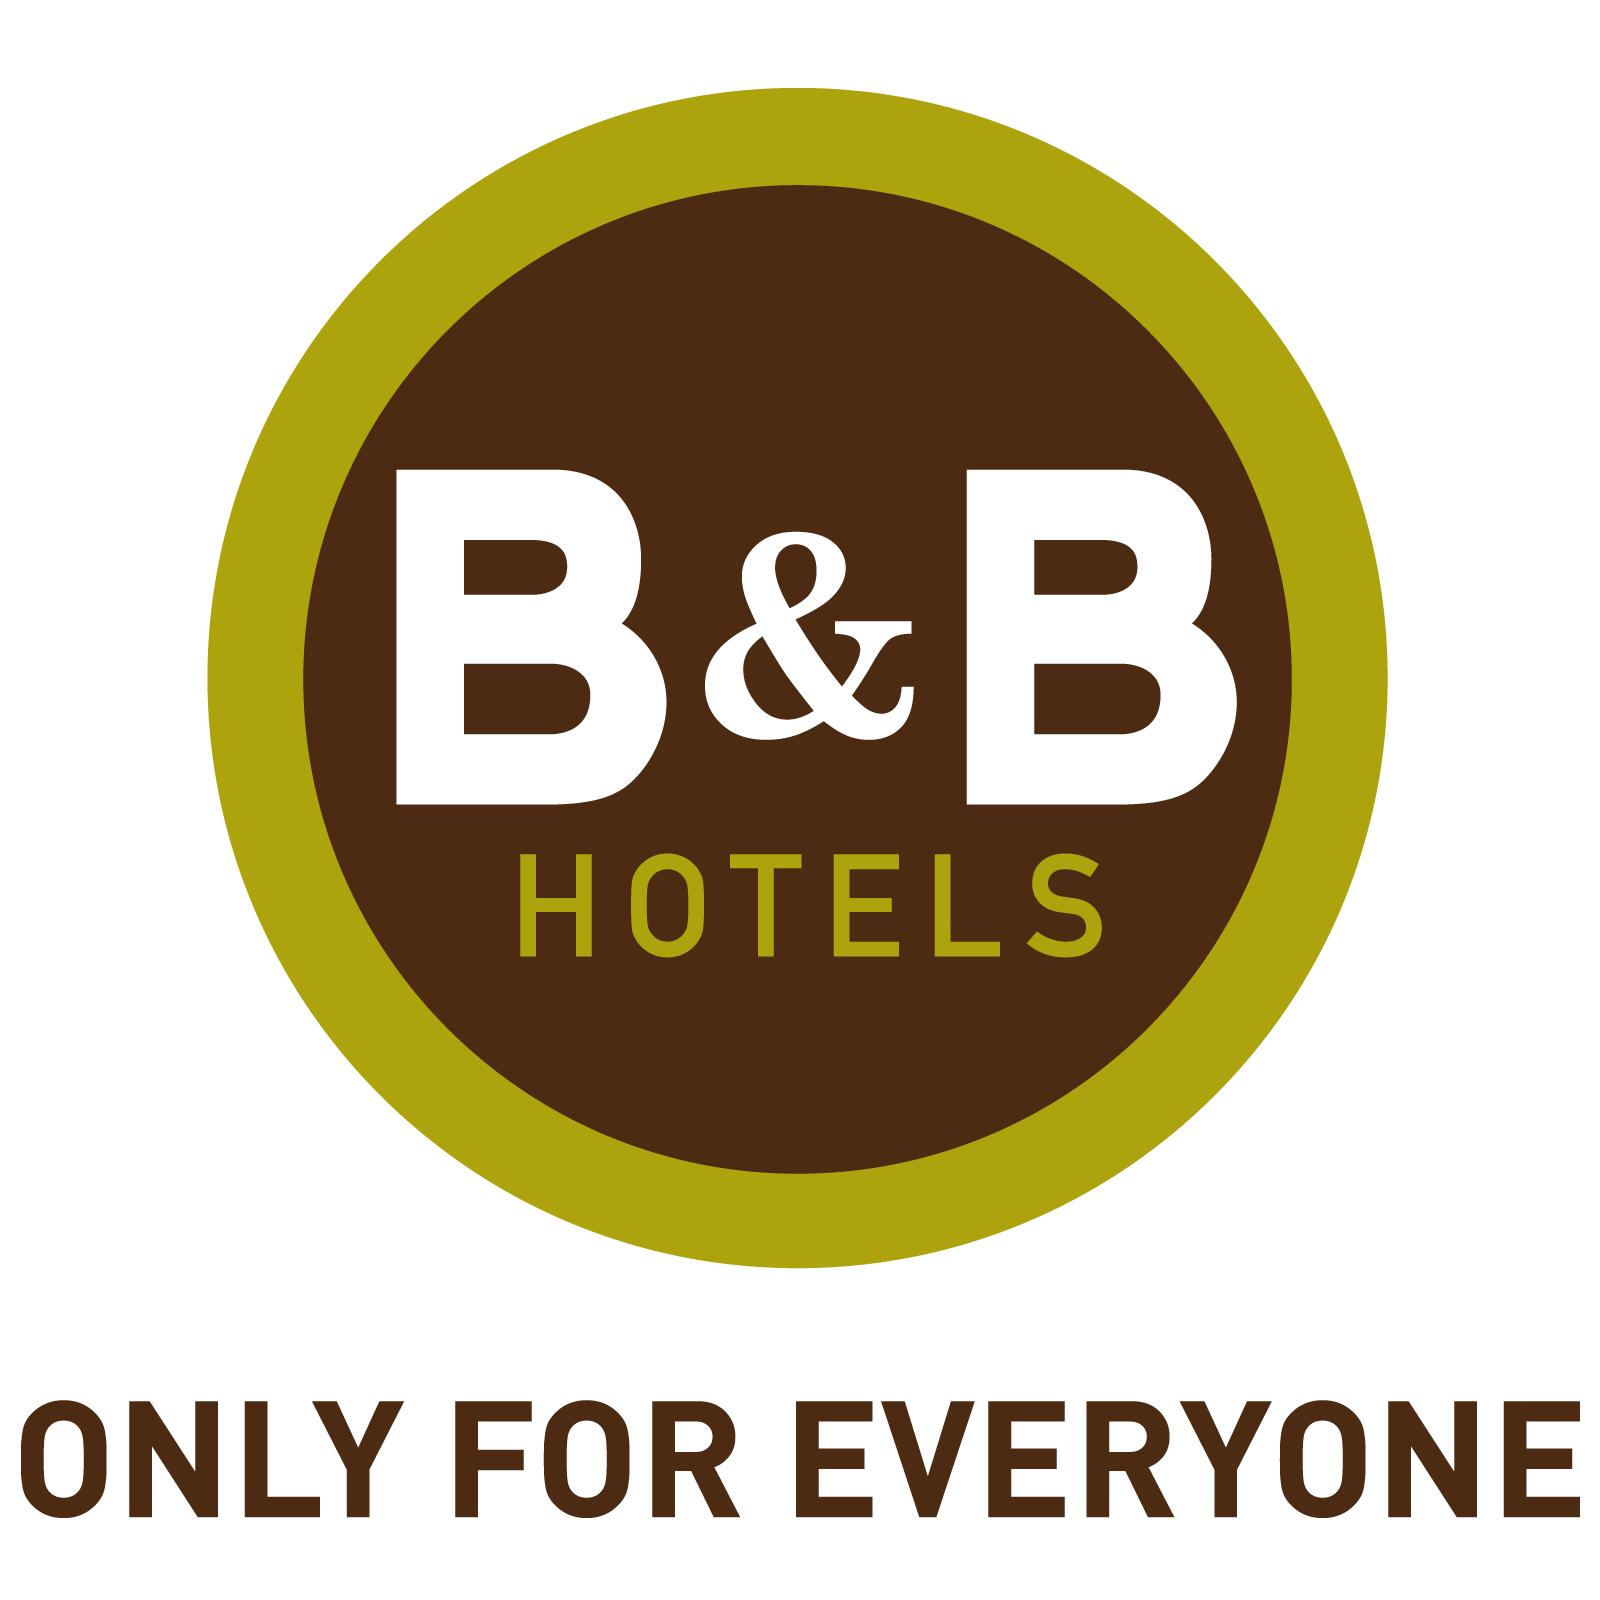 Bild zu B&B Hotel Kempten in Kempten im Allgäu